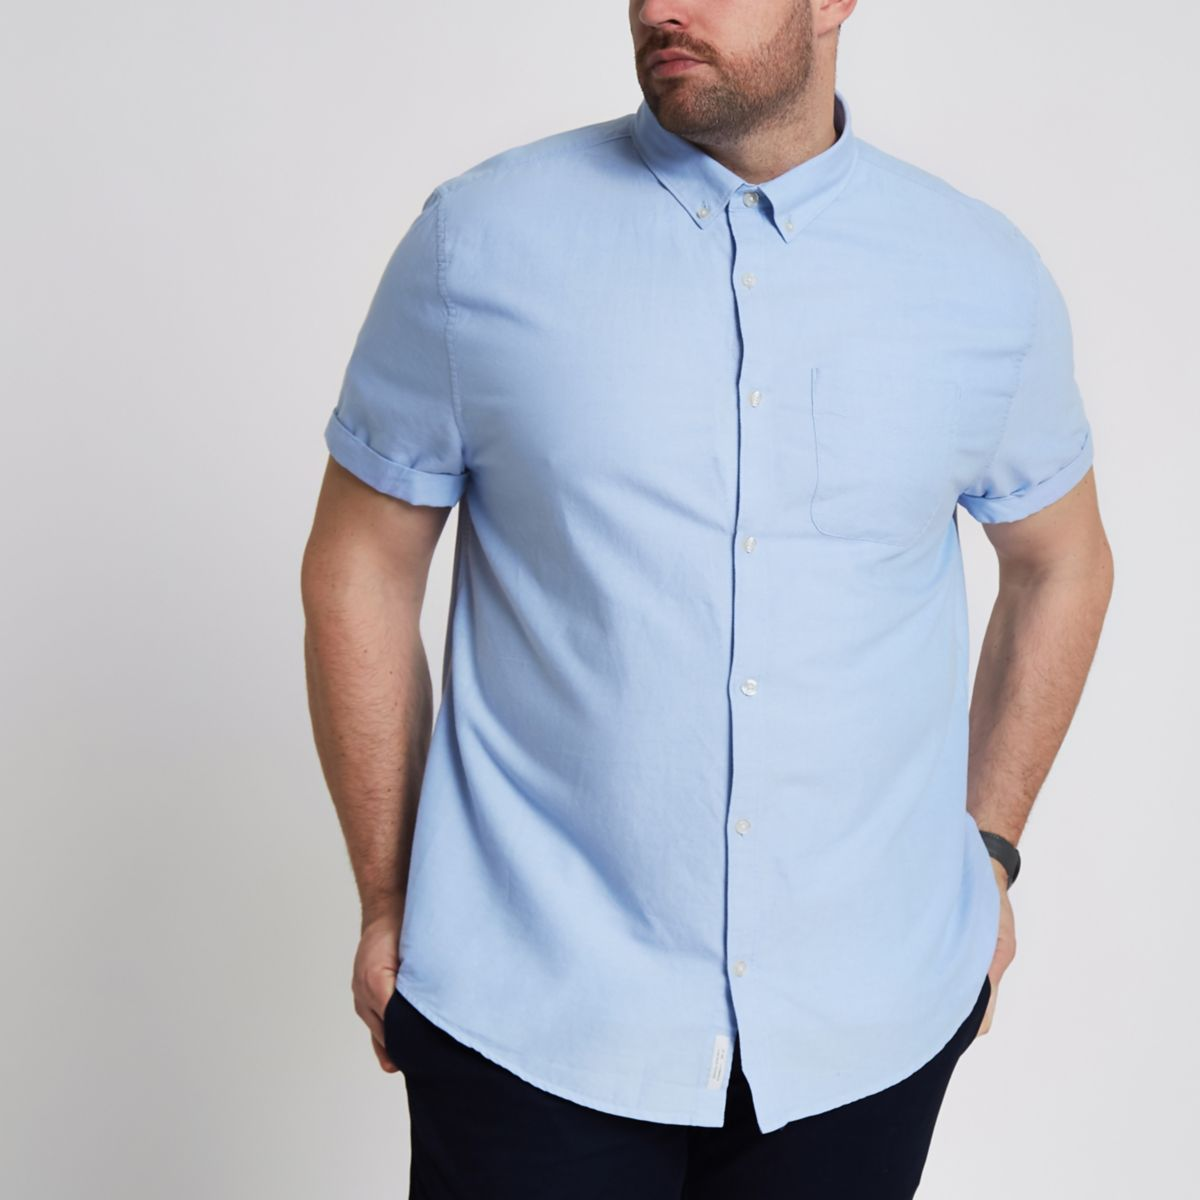 Chemise Oxford Big & Tall bleue à manches courtes